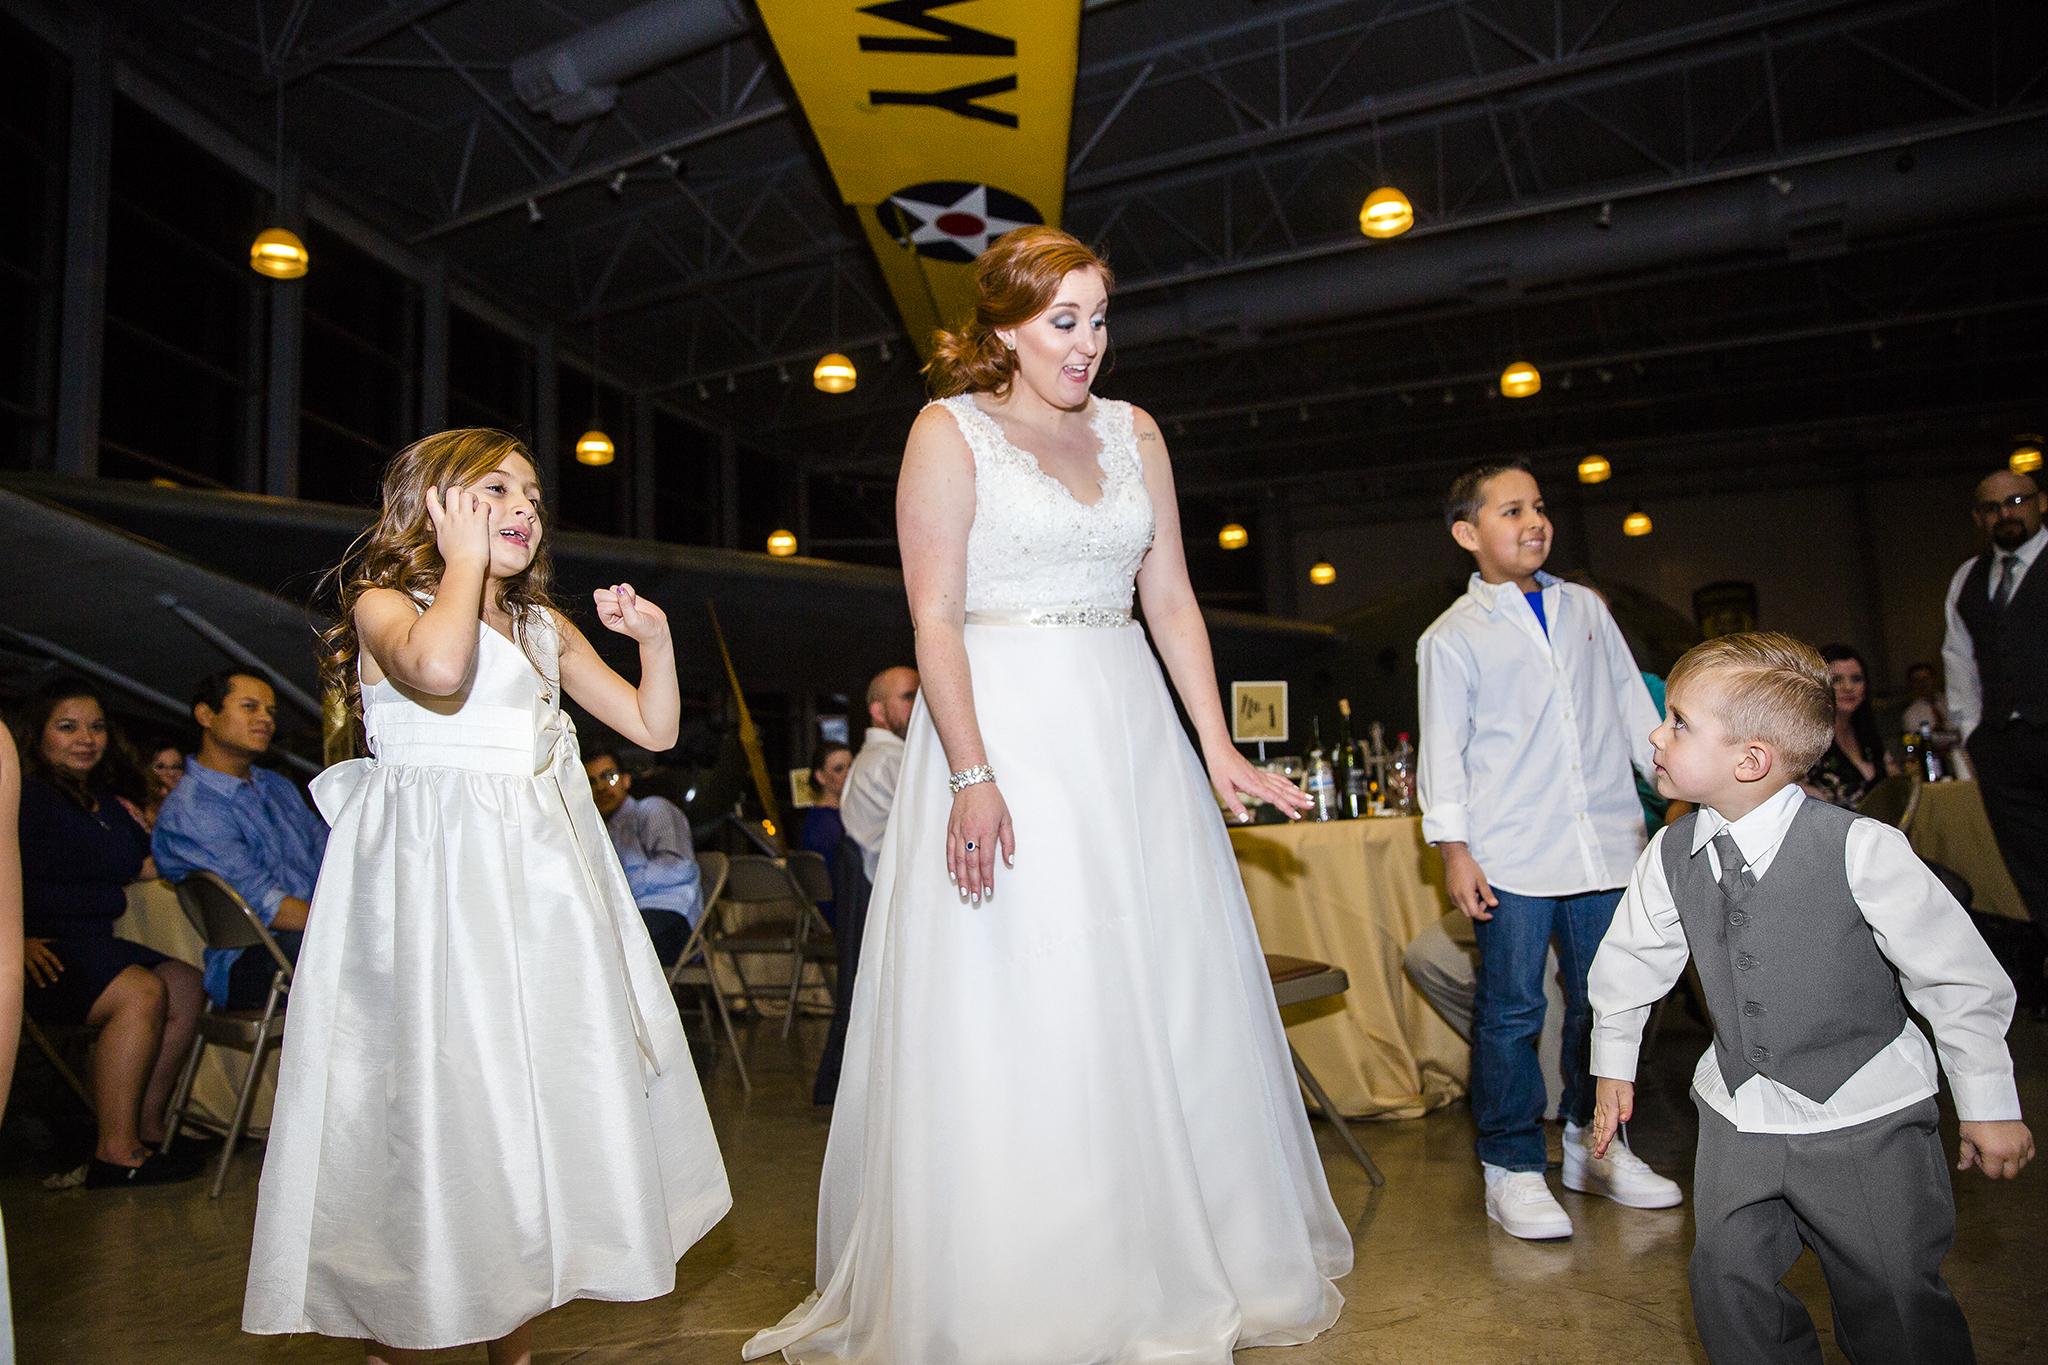 wedding dance, mother daughter and son, fun wedding reception